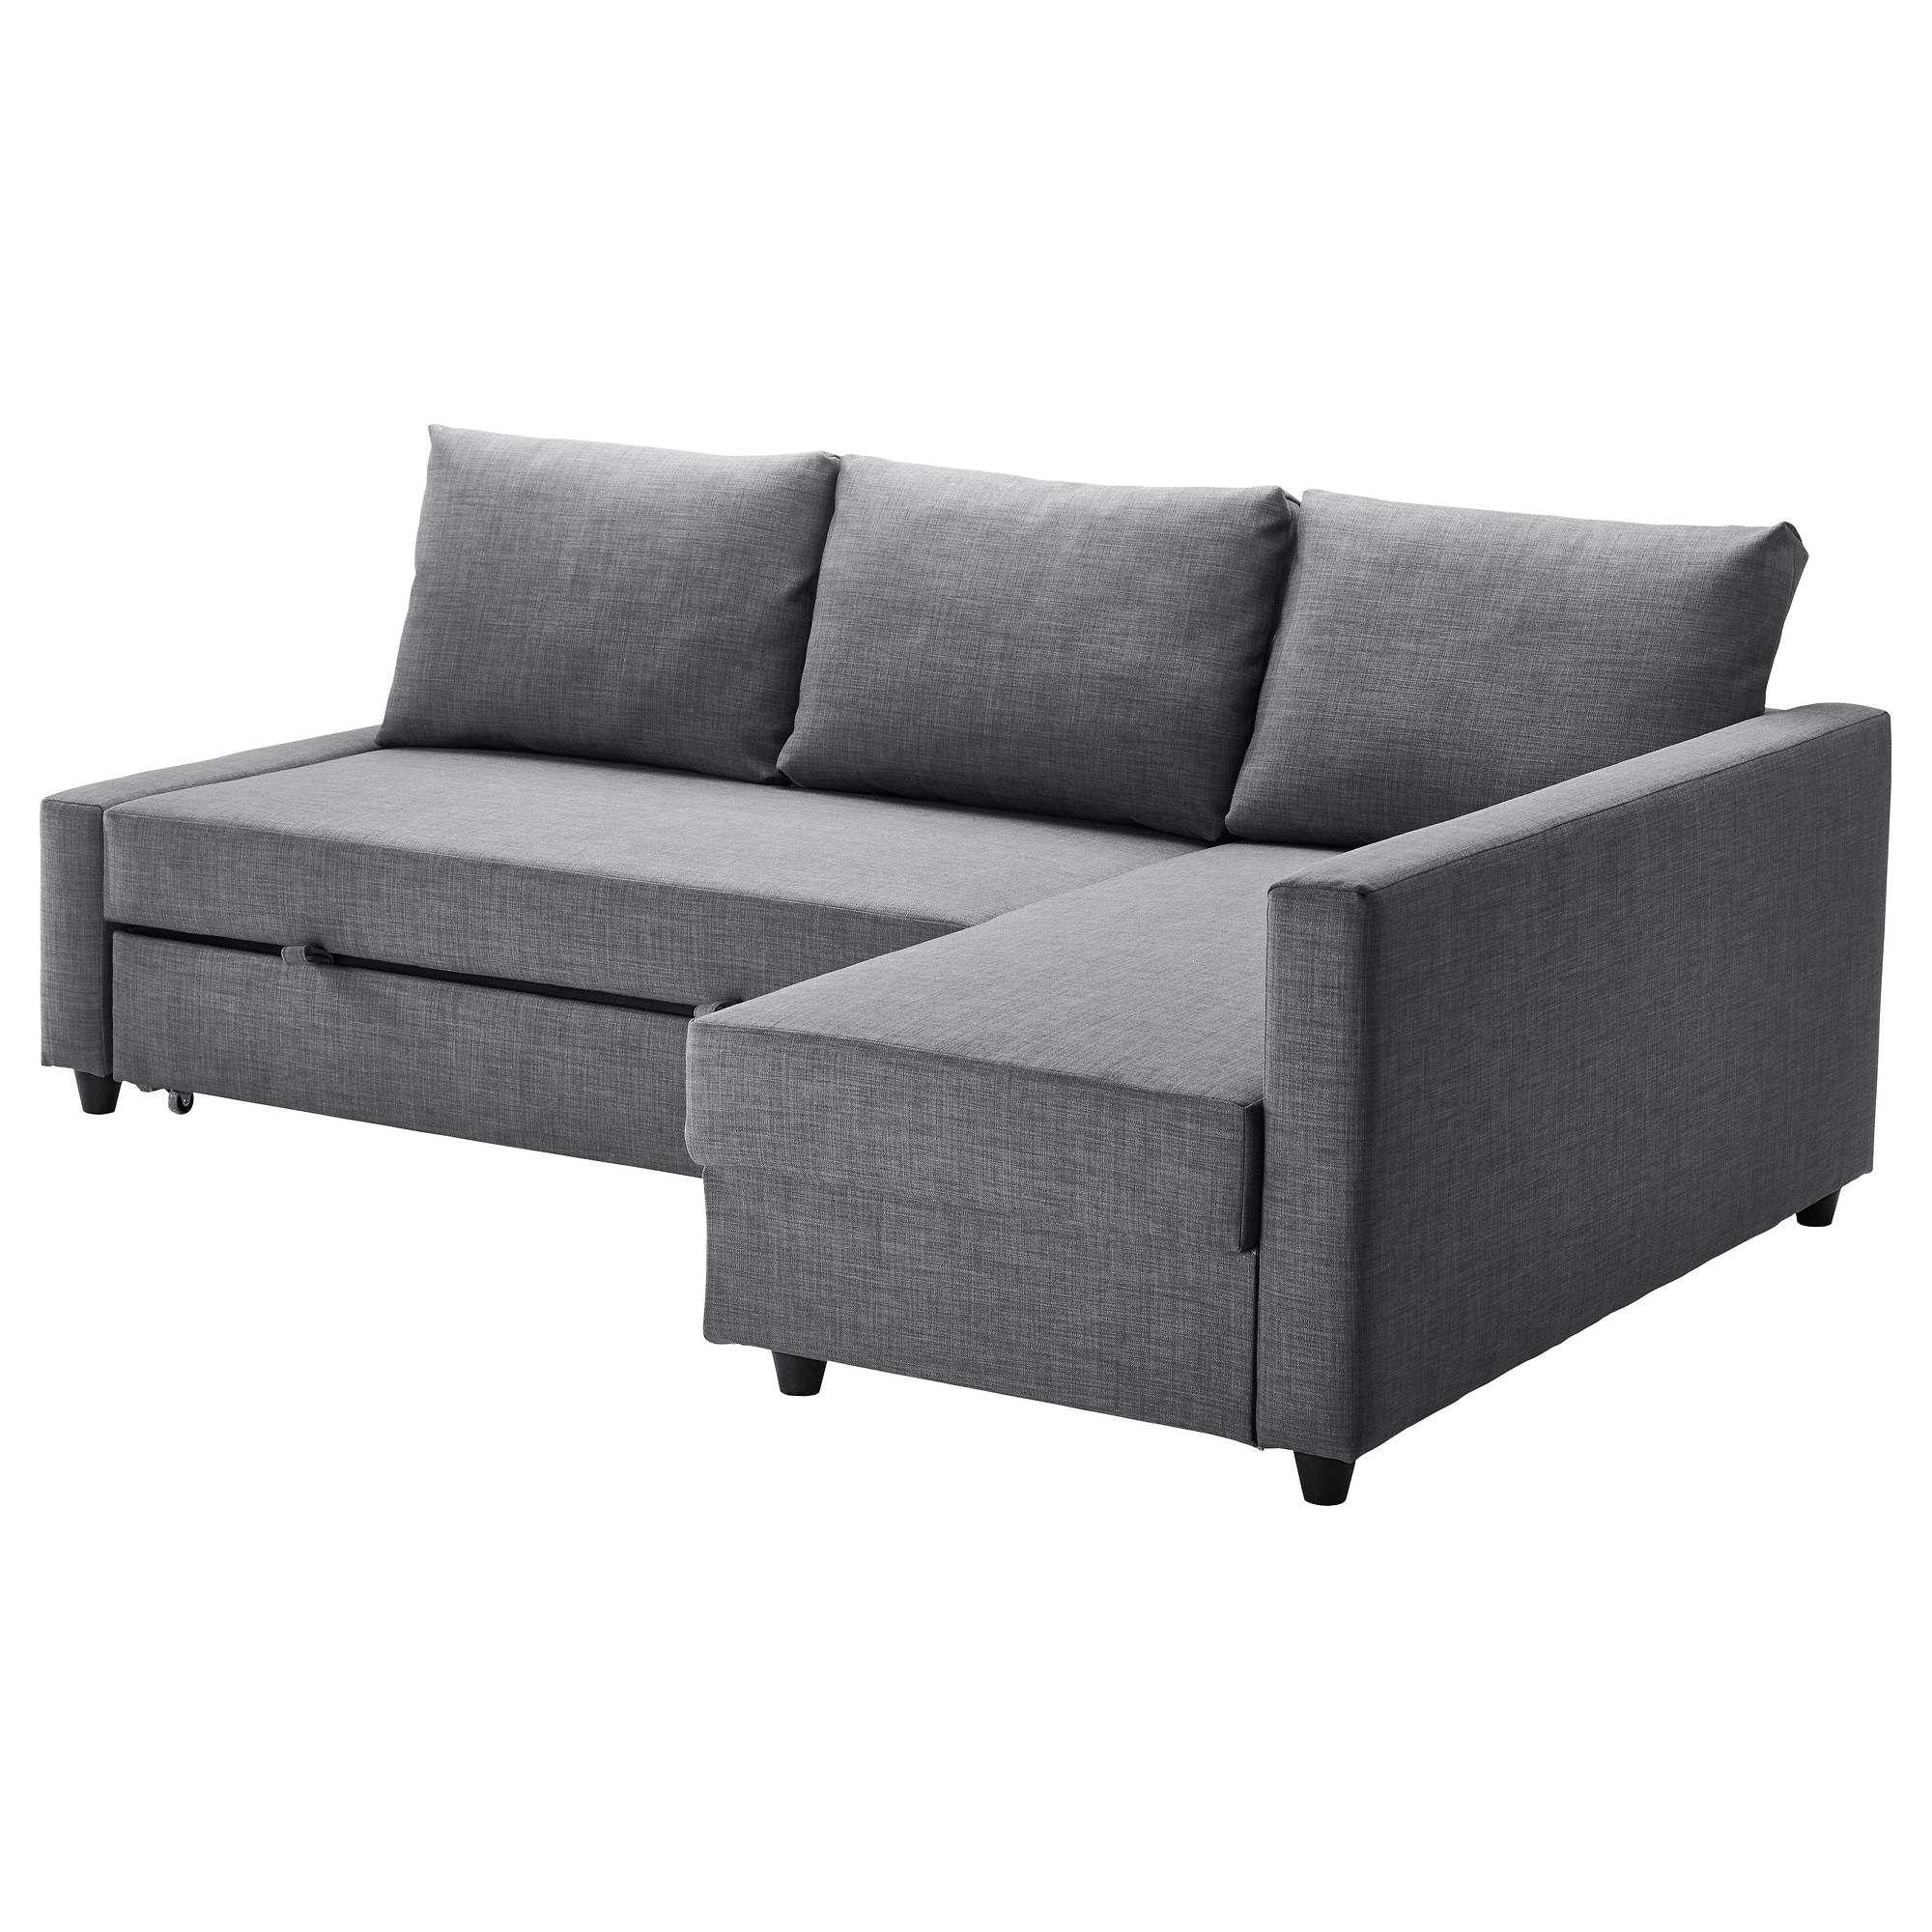 Friheten Corner Sofa Bed With Storage Skiftebo Dark Grey – Ikea Throughout London Dark Grey Sofa Chairs (View 11 of 20)